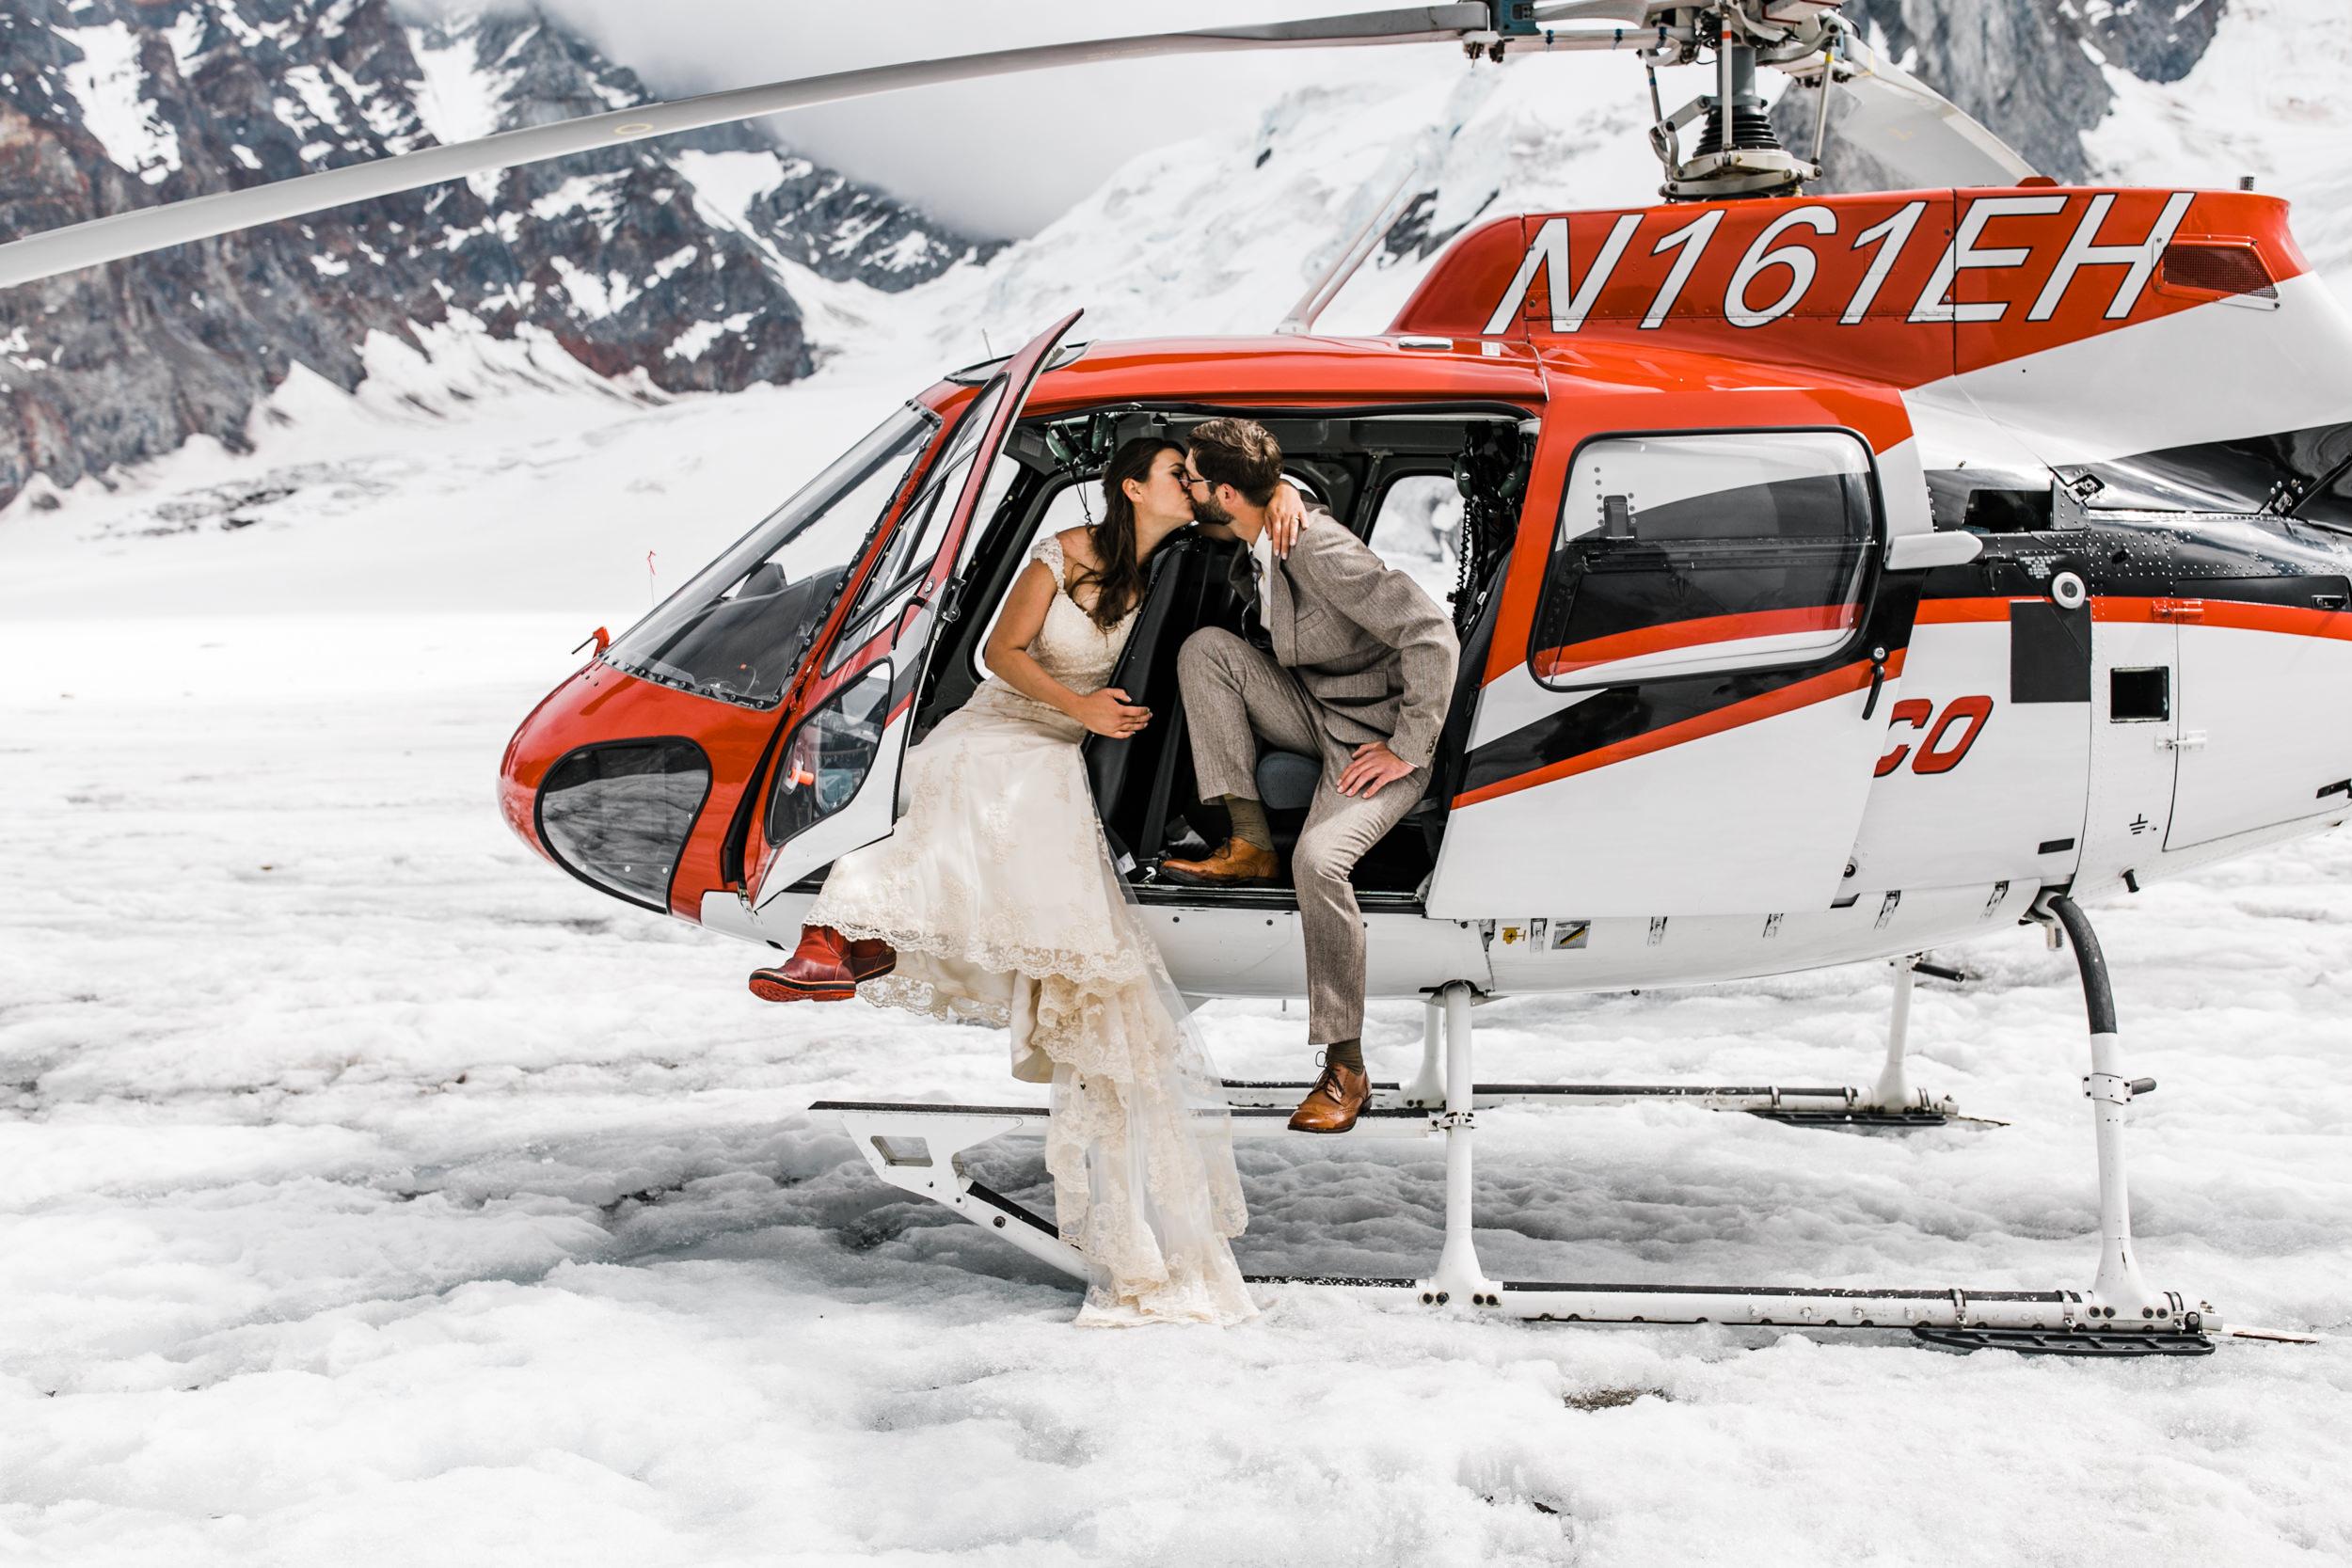 Denali-National-Park-Helicopter-Tour-Wedding-Glacier-Landing-Hearnes-Elopement-Photography-17.jpg